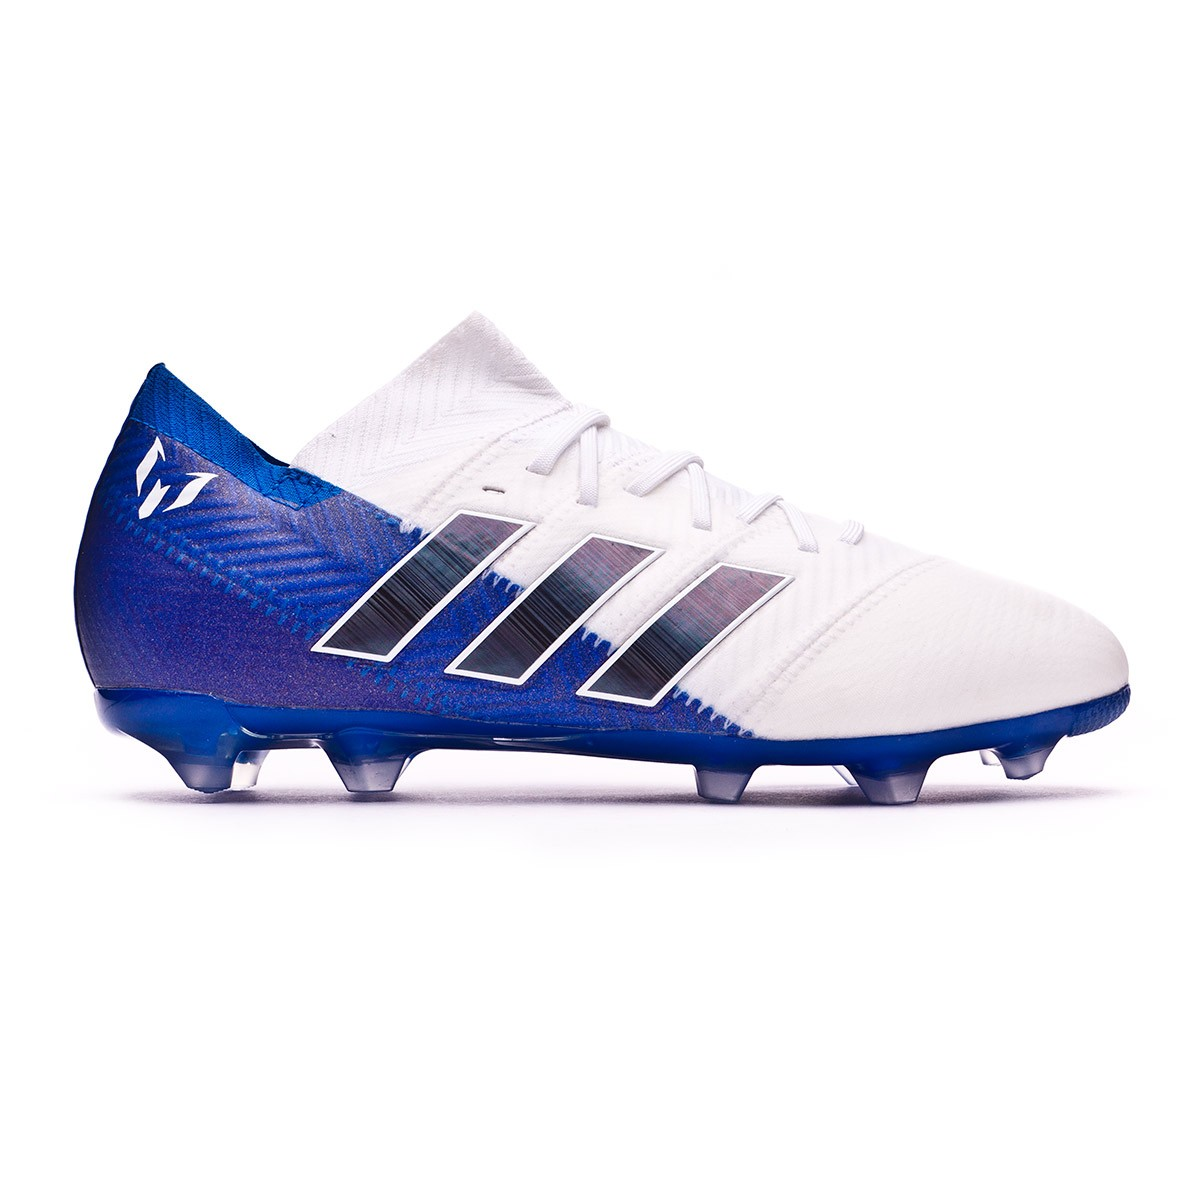 c97f2387a8c18 Zapatos de fútbol adidas Nemeziz Messi 18.1 FG Niño White-Core  black-Football blue - Tienda de fútbol Fútbol Emotion